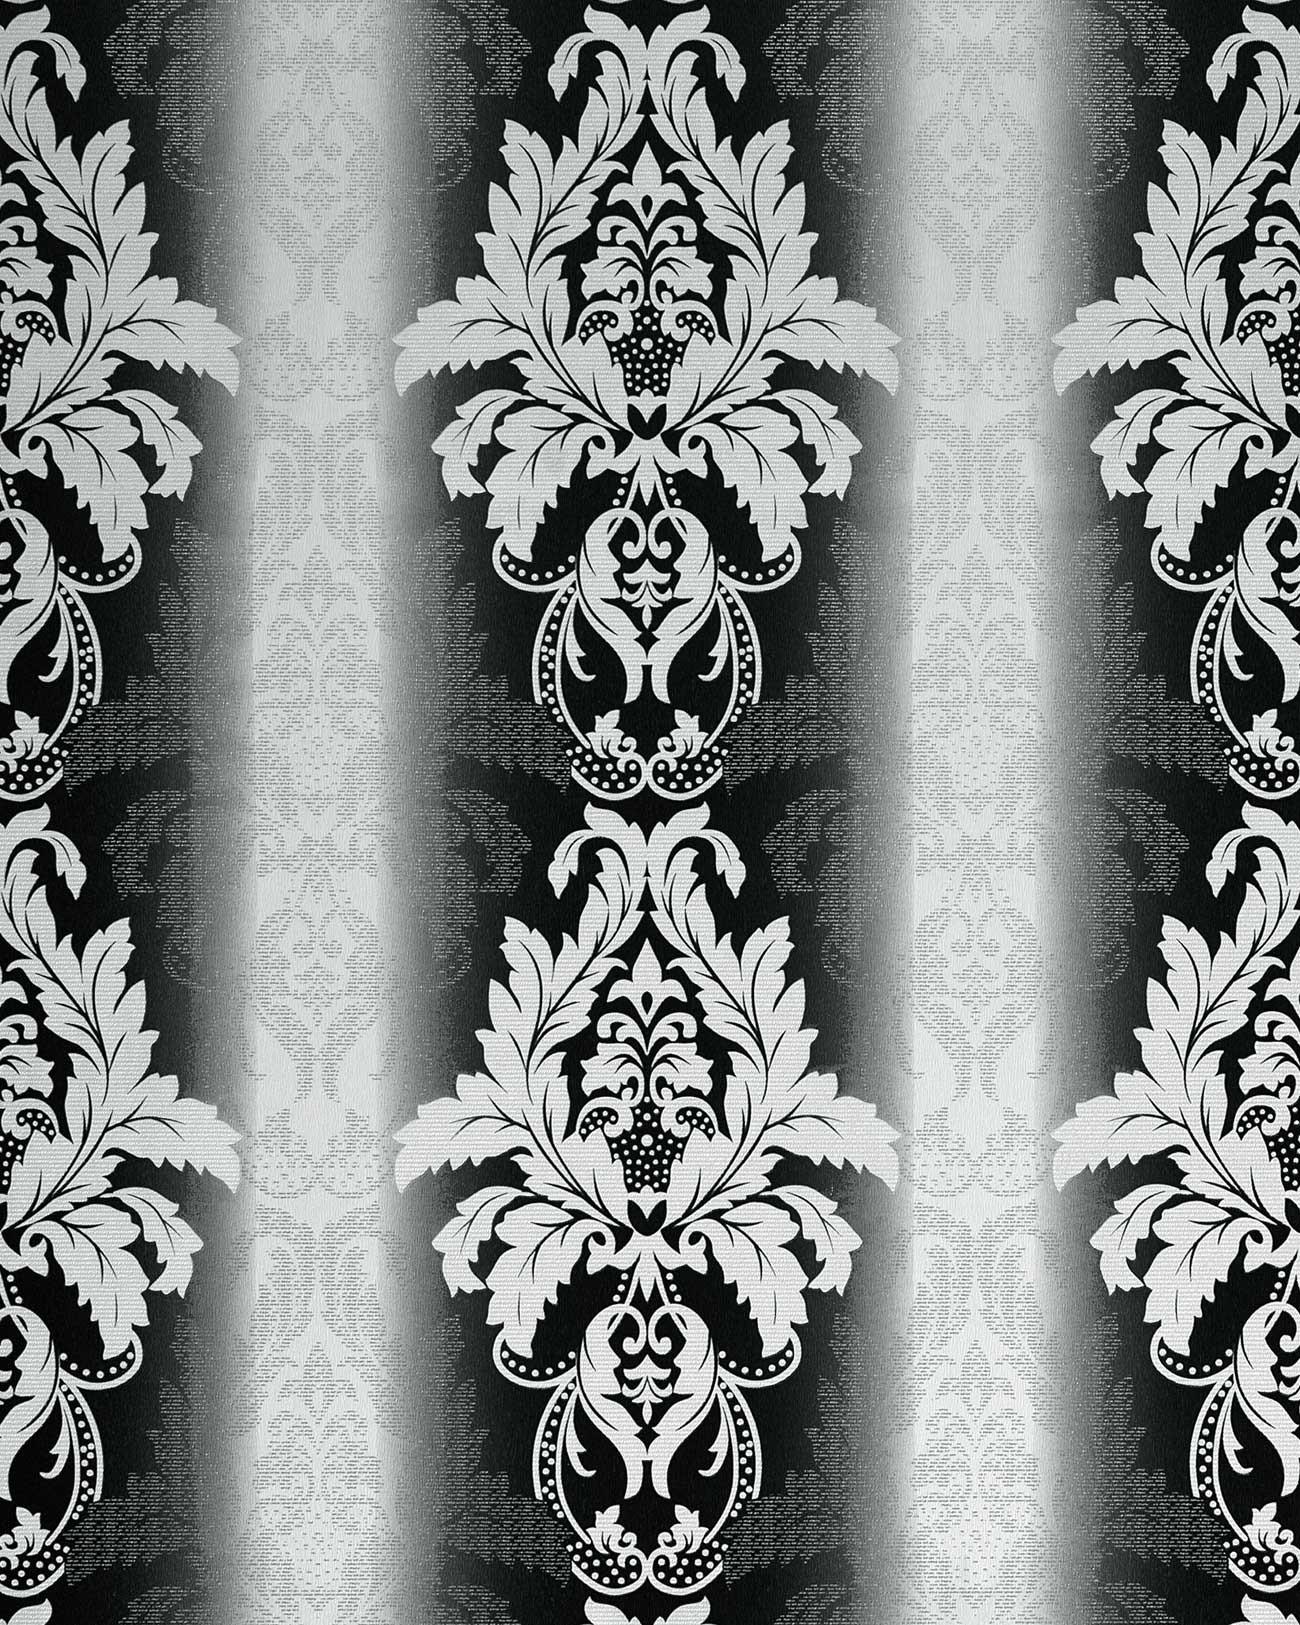 3d Barock Tapete Damask Edem 770 30 Luxus Tapete Hochwertige 3d